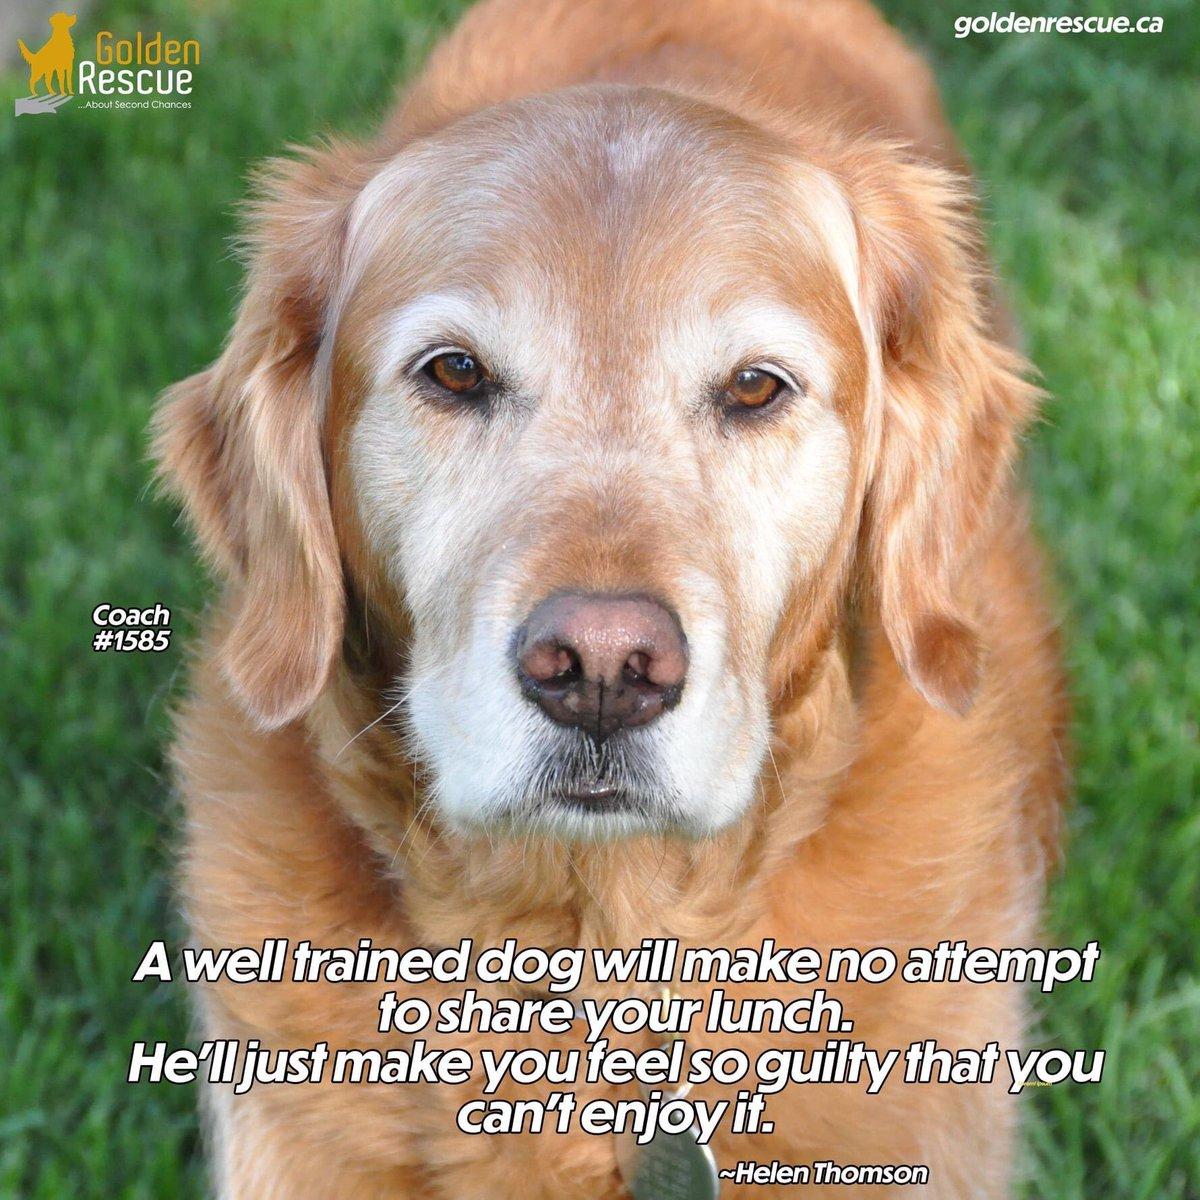 How many of us can relate?!  #goldenretriever #rescuedog #adoptdontshop #rescue #canada #secondchances #pet #dog #animal #adorable #goldenretrieverdog #cute #goldensrule #ilovemygolden #ilovegoldenretrievers #chien #perro #welovegoldens #foreverfamilypic.twitter.com/iHGPiv7Gok